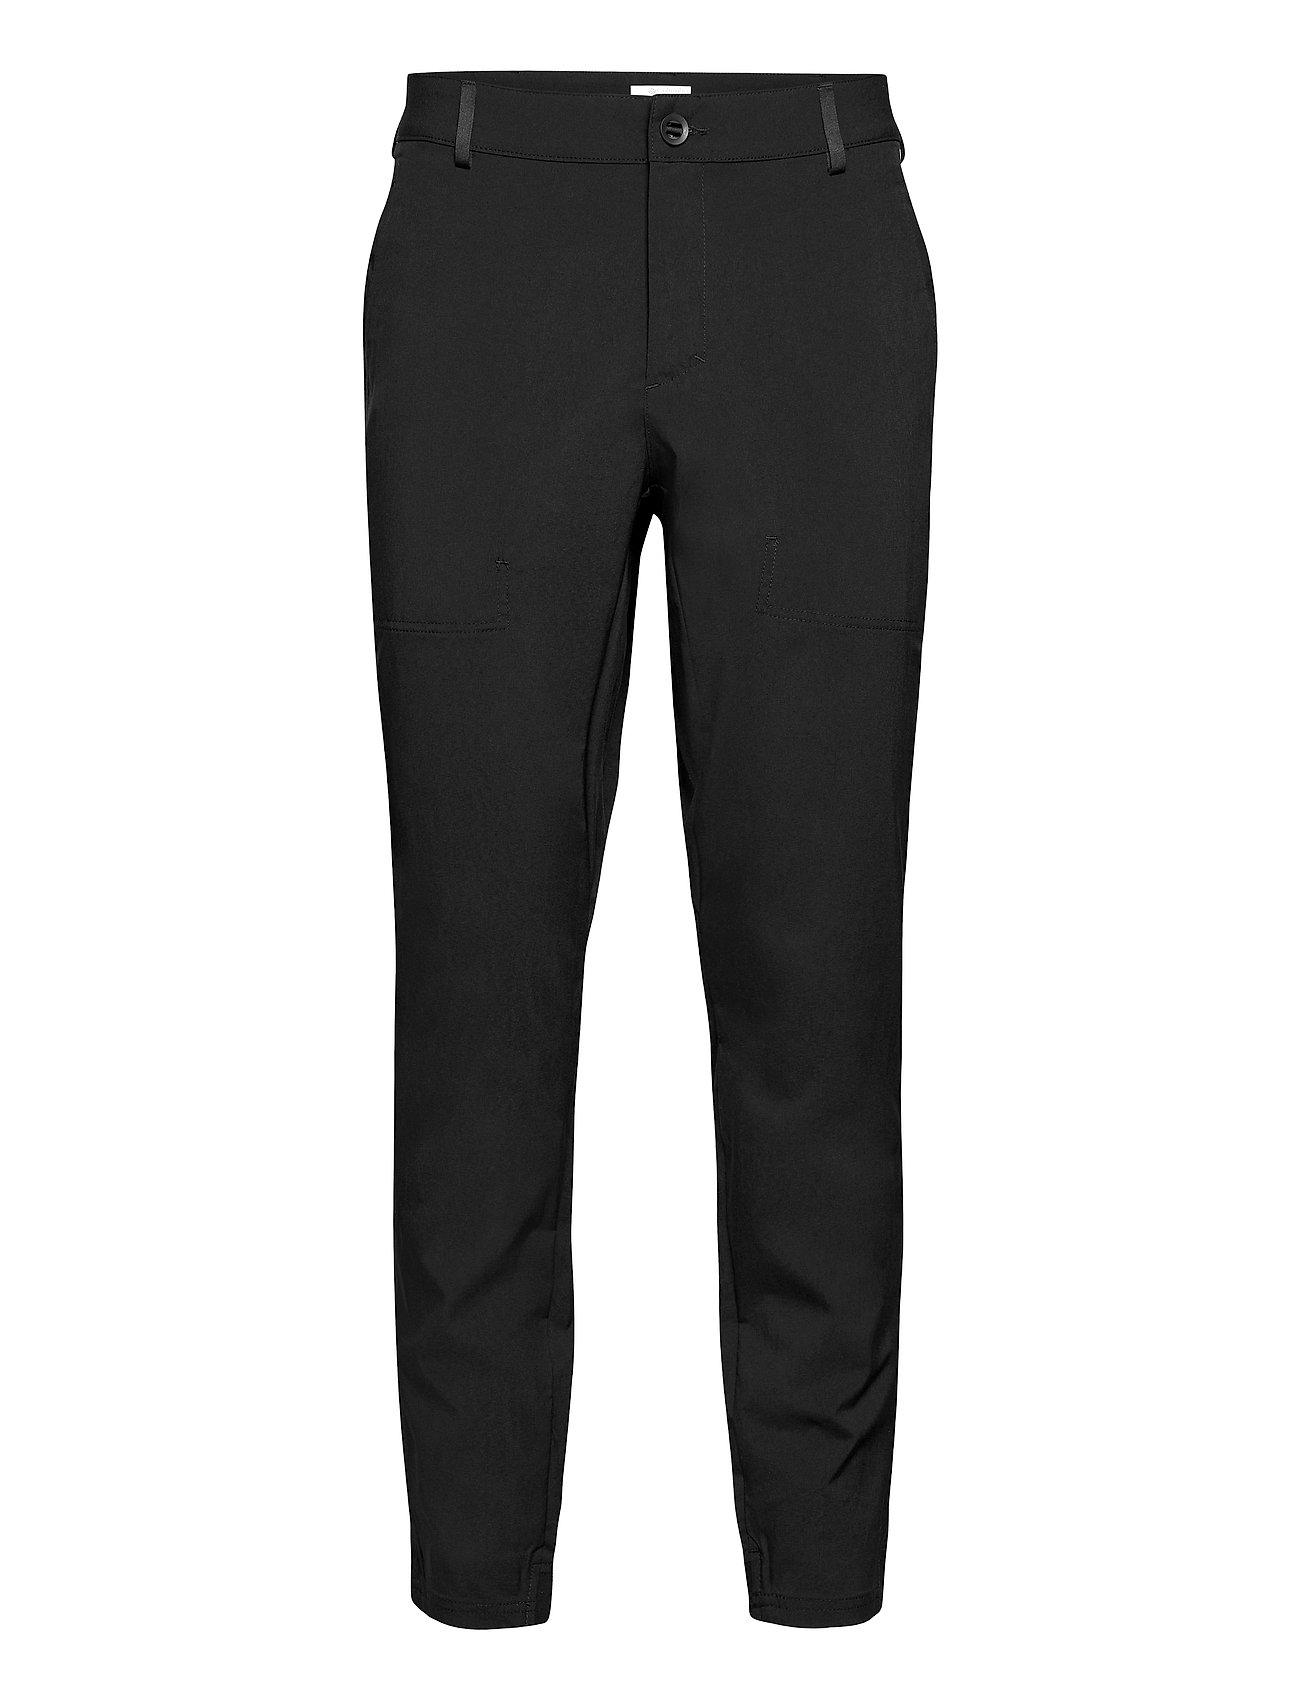 Image of West End™ Pant Sport Pants Sort Columbia (3512922197)